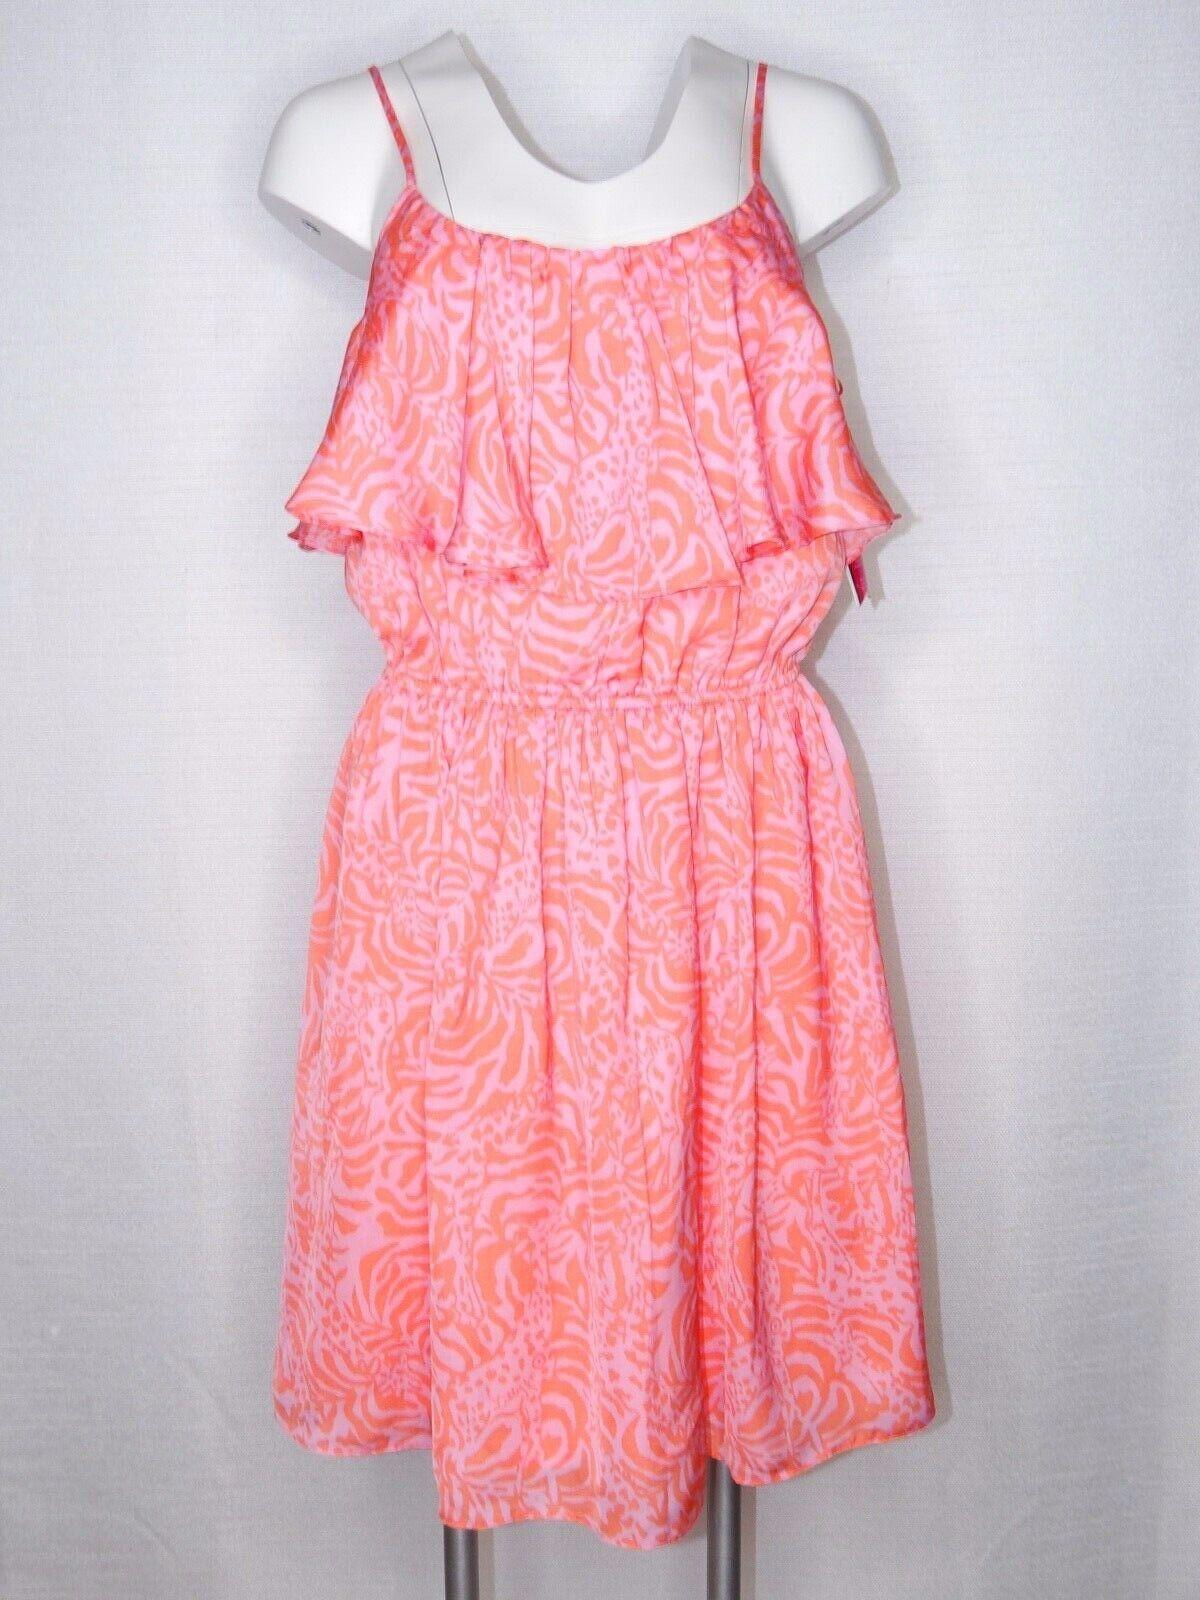 Lilly Pulitzer for Target Dress Medium Fit S-M Neon Rosa & Orange Girafeeeye